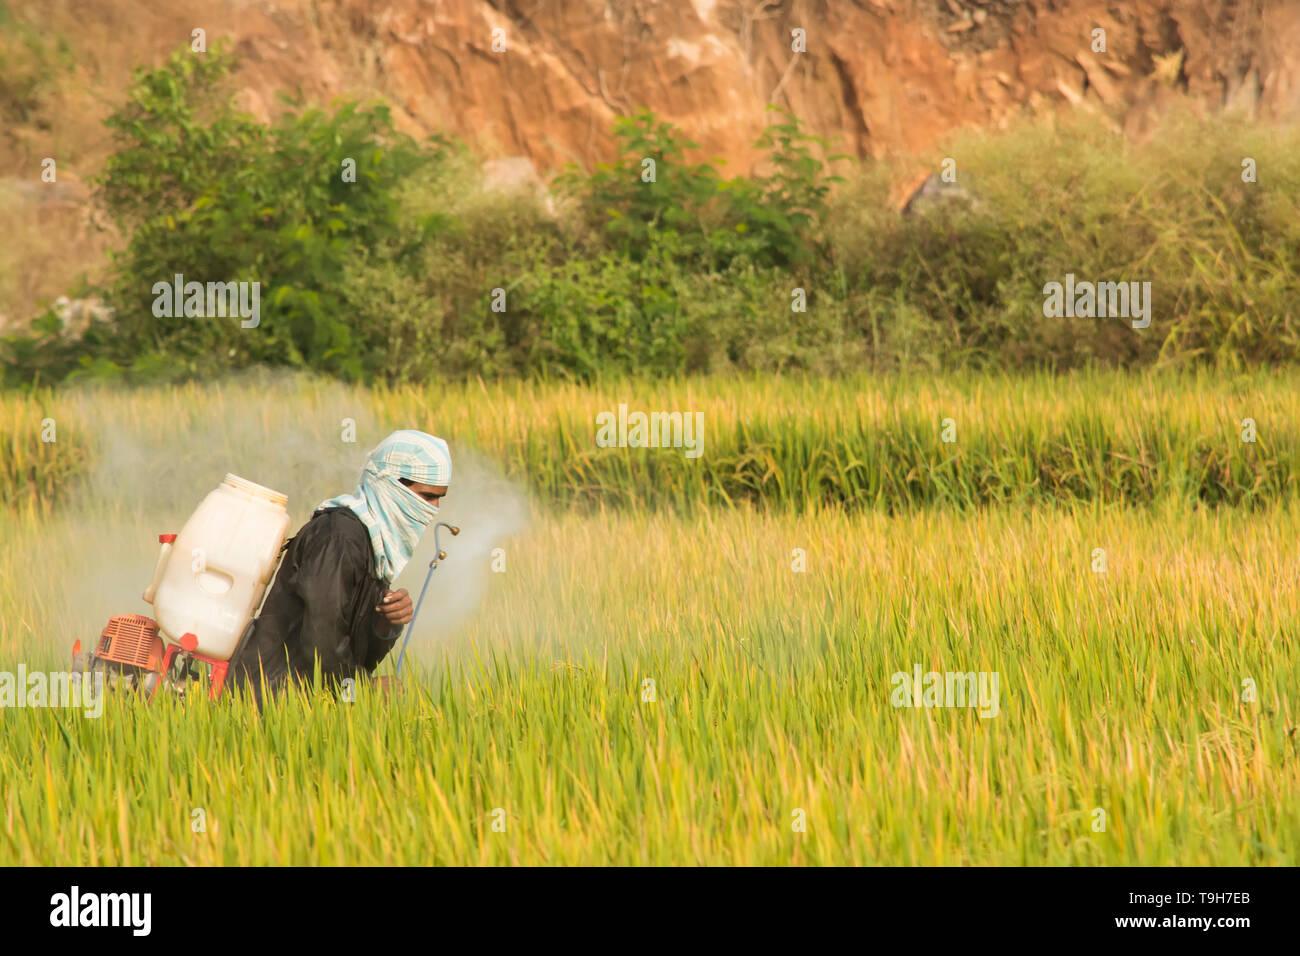 Maski,Karnataka,India - December 2,2017 Farmer spraying pesticide in paddy field - Stock Image